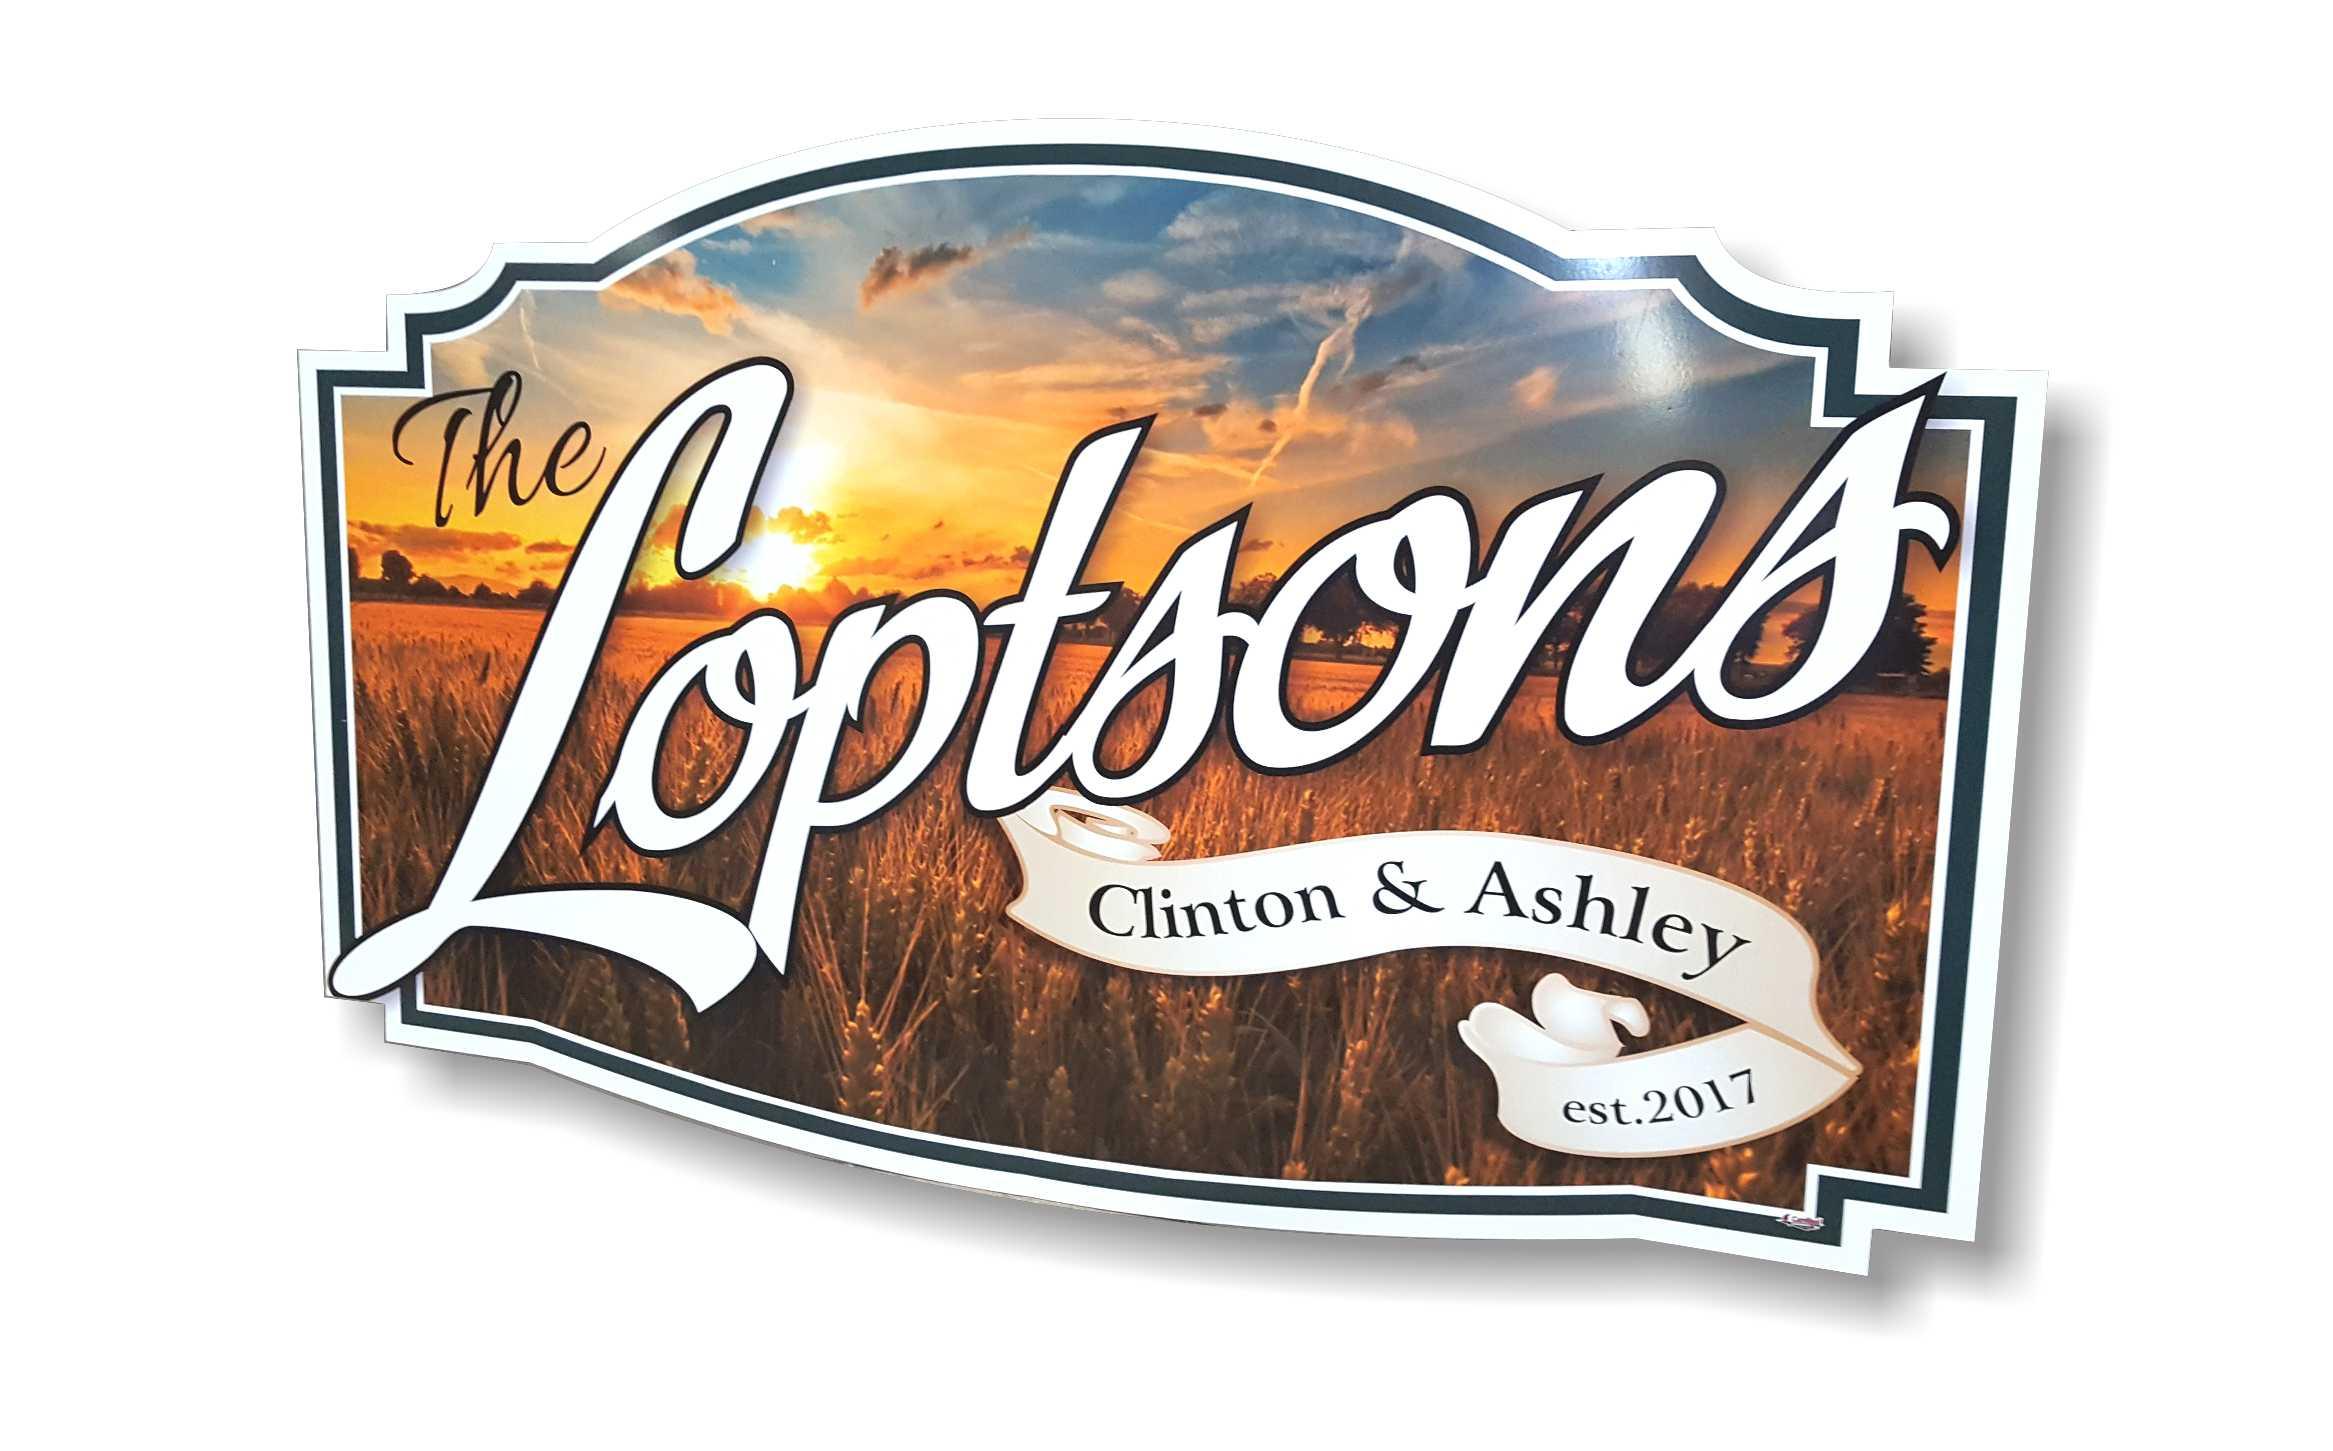 Loptsons